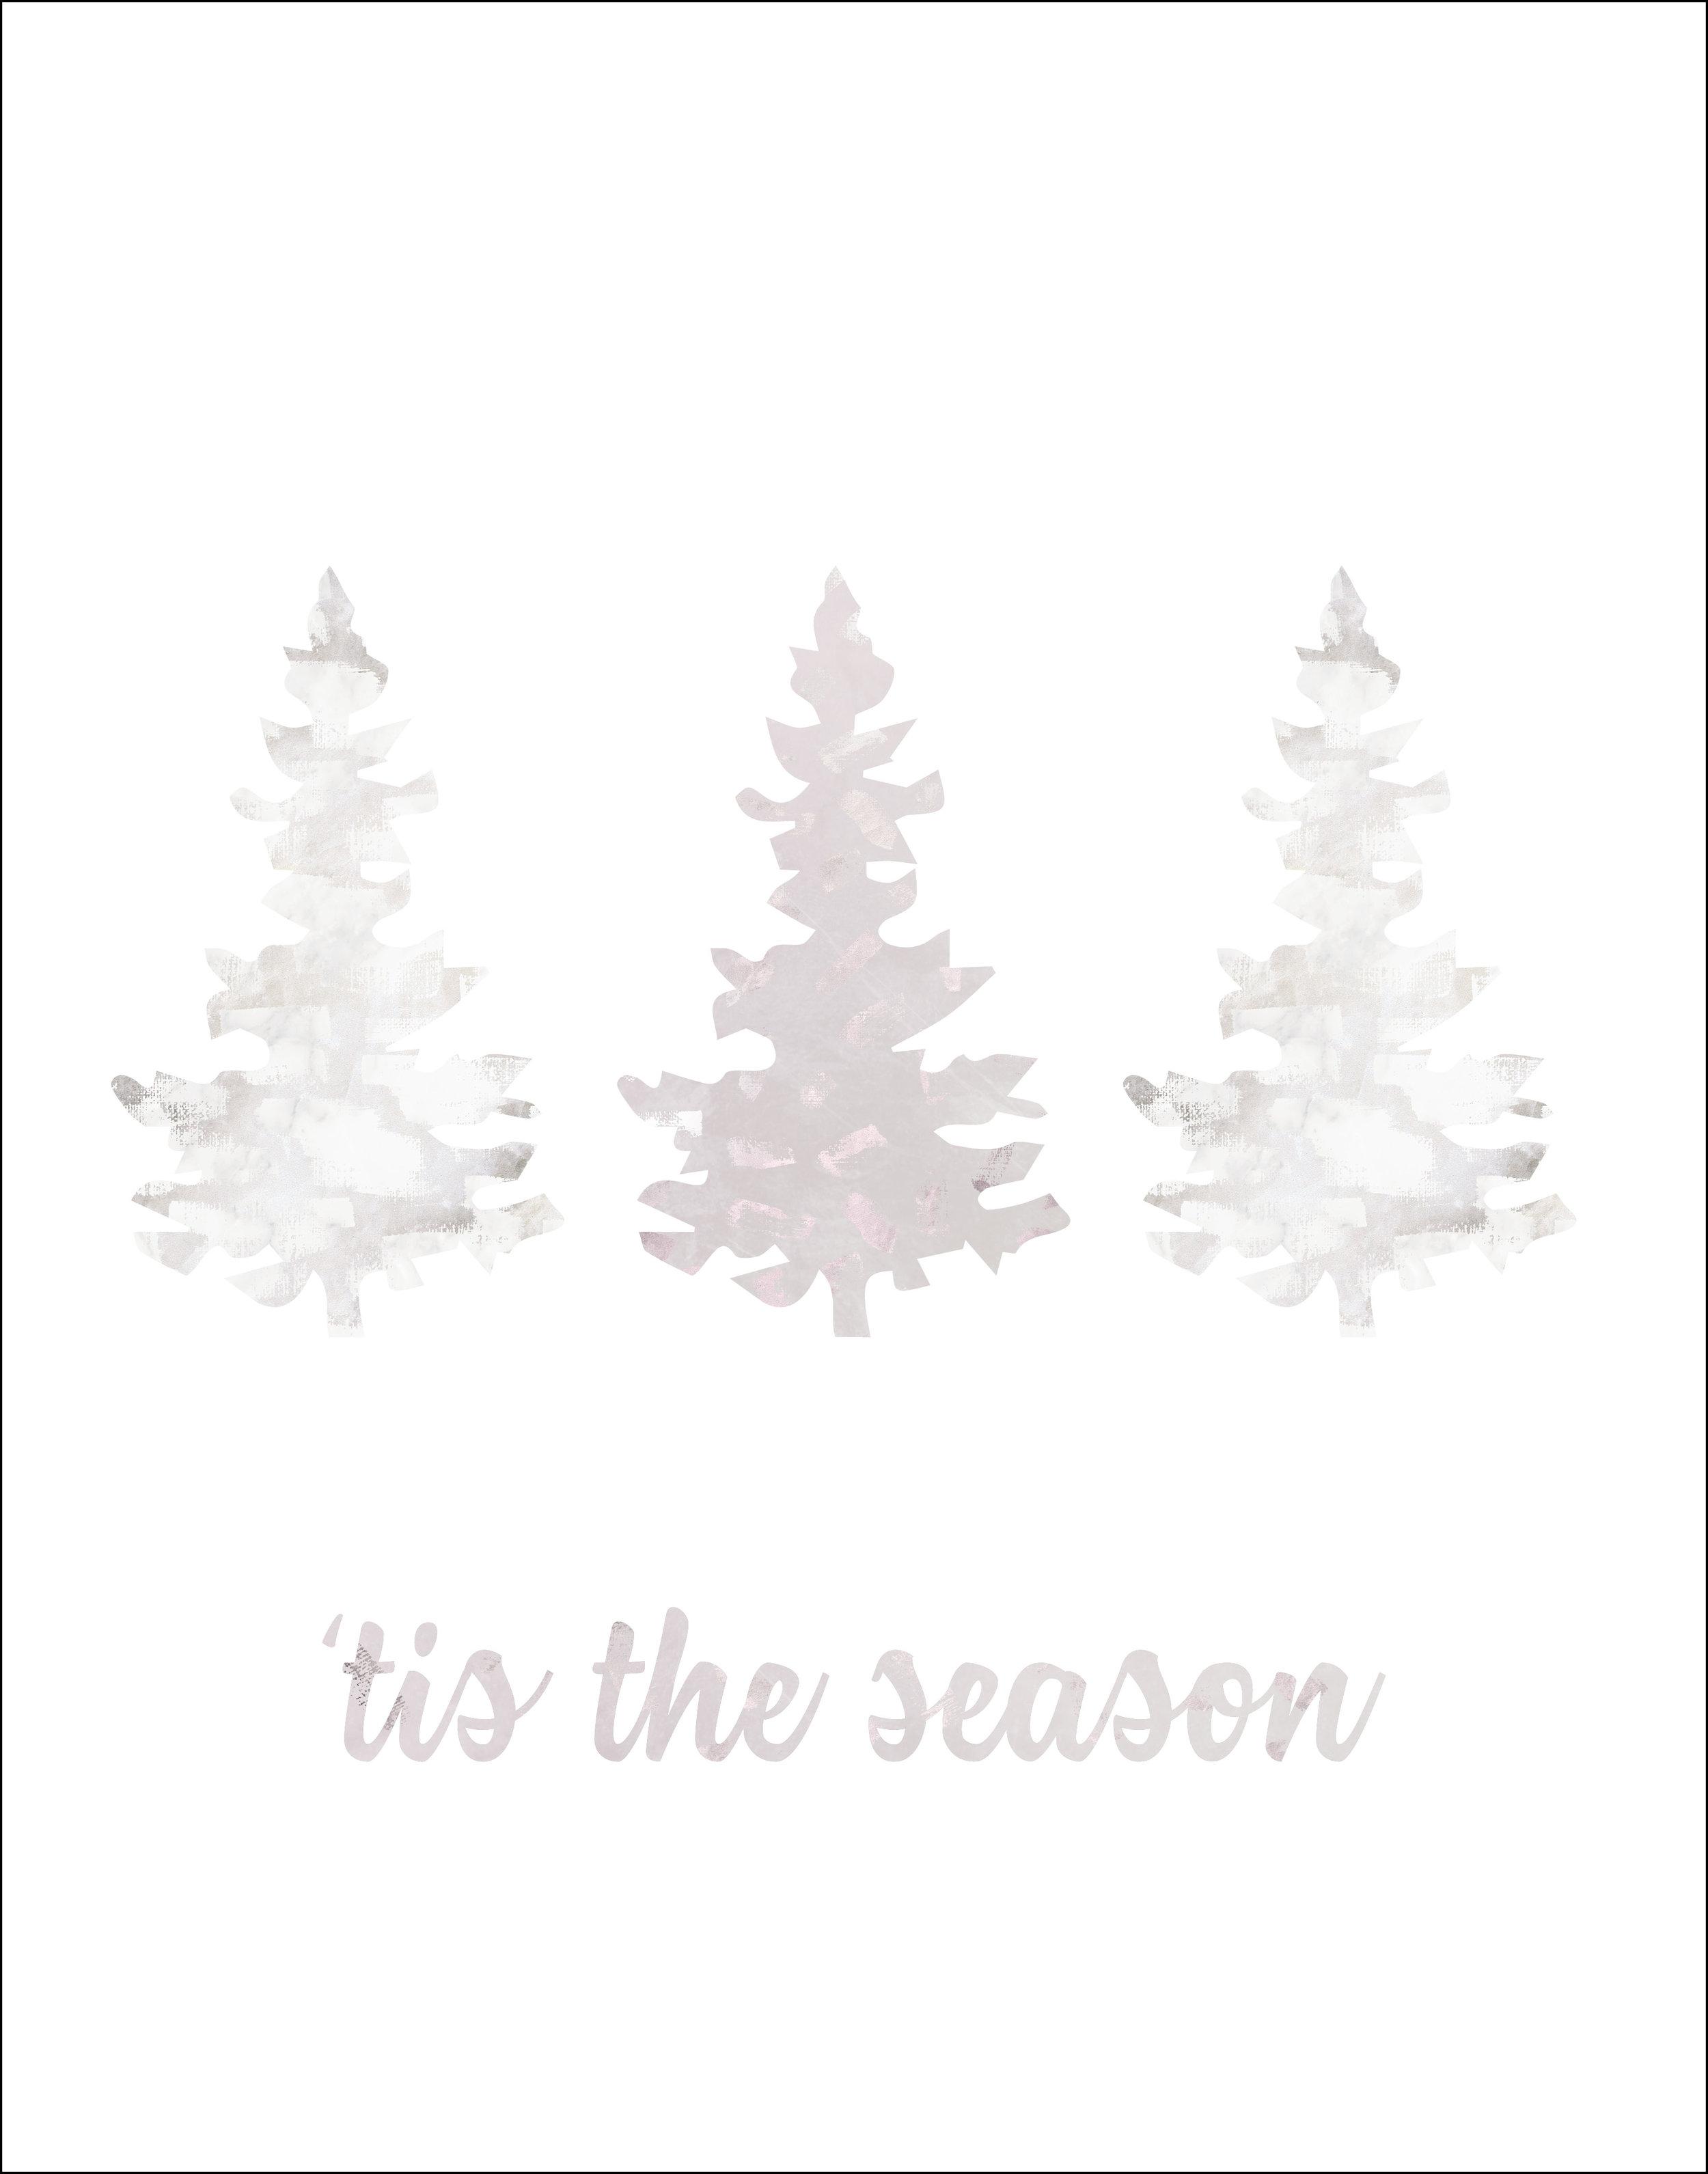 Tis The Season3.jpg